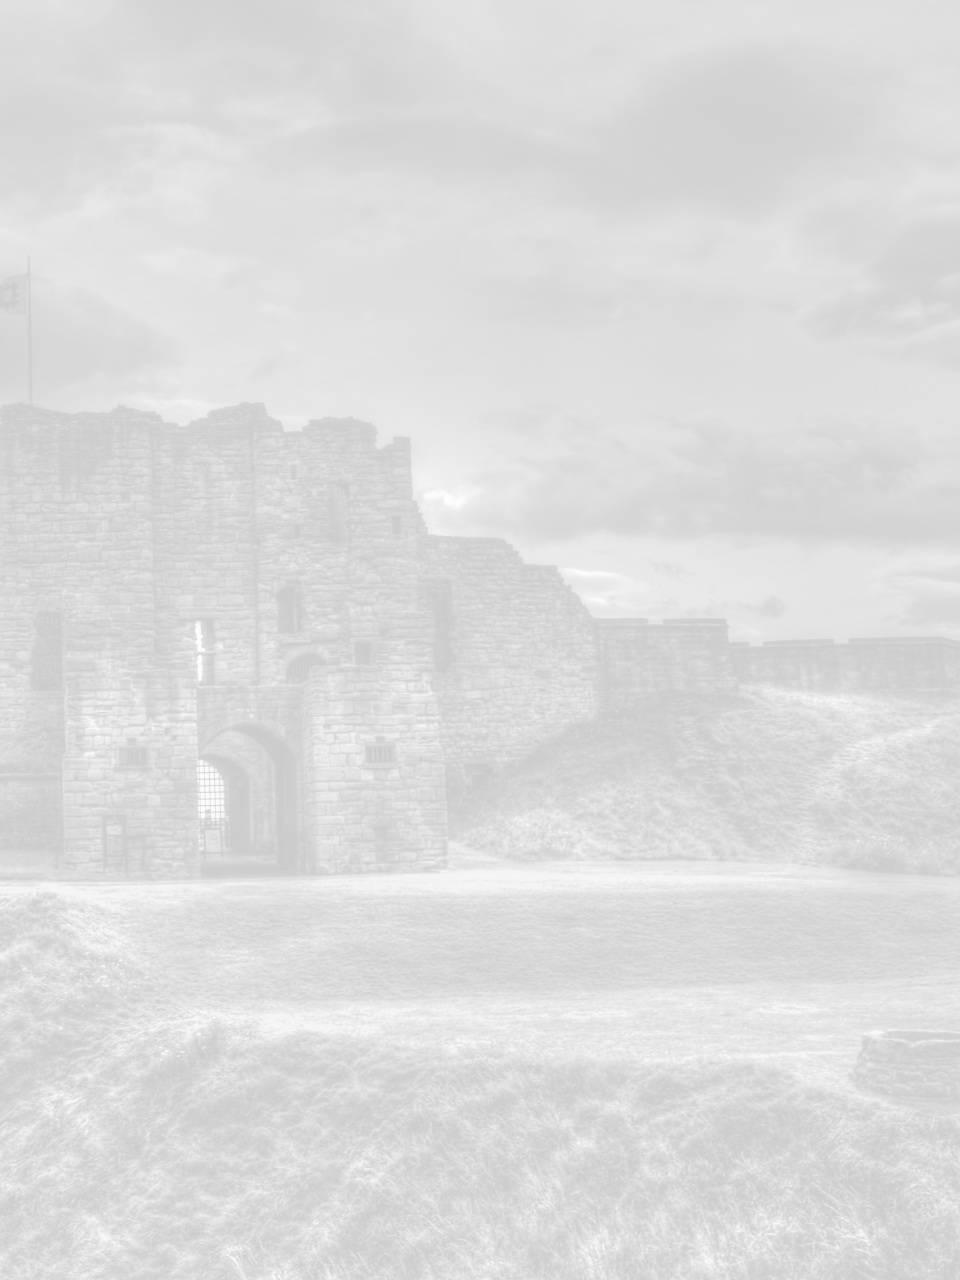 seo newcastle image for newcastle castle